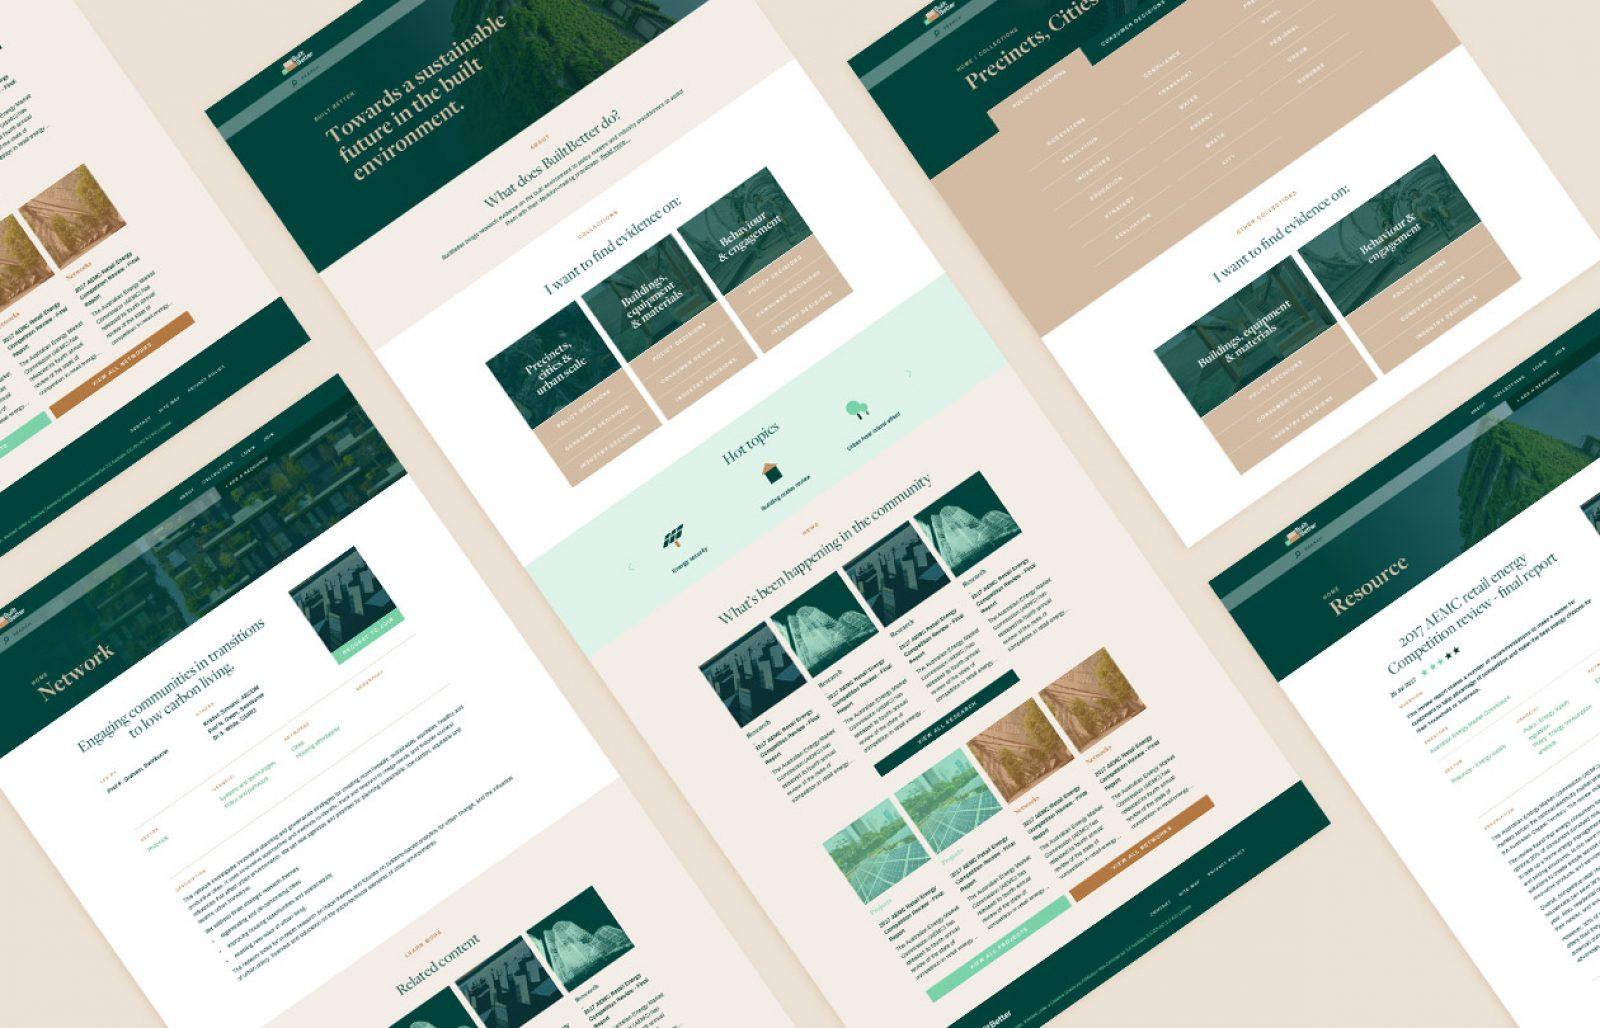 BuiltBetter website lower pages design